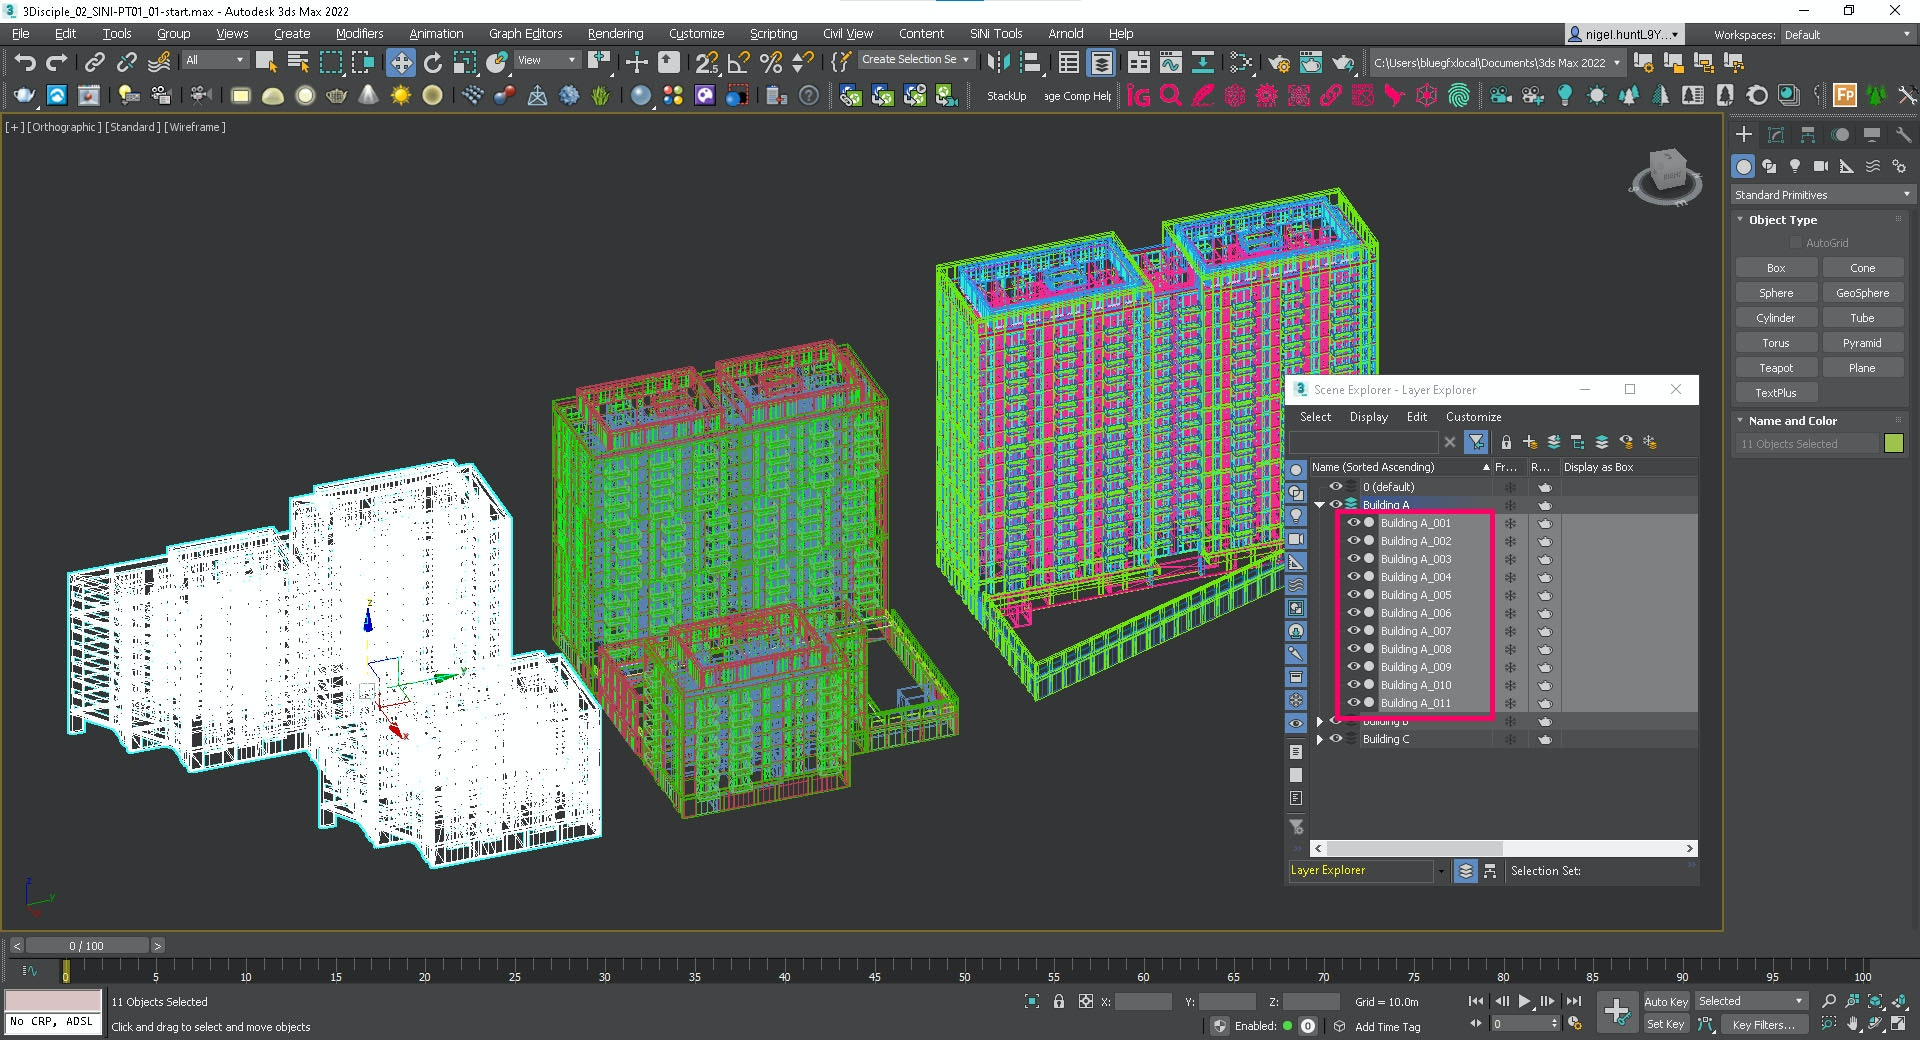 Screenshot showing Sculpt - Explode by Material.